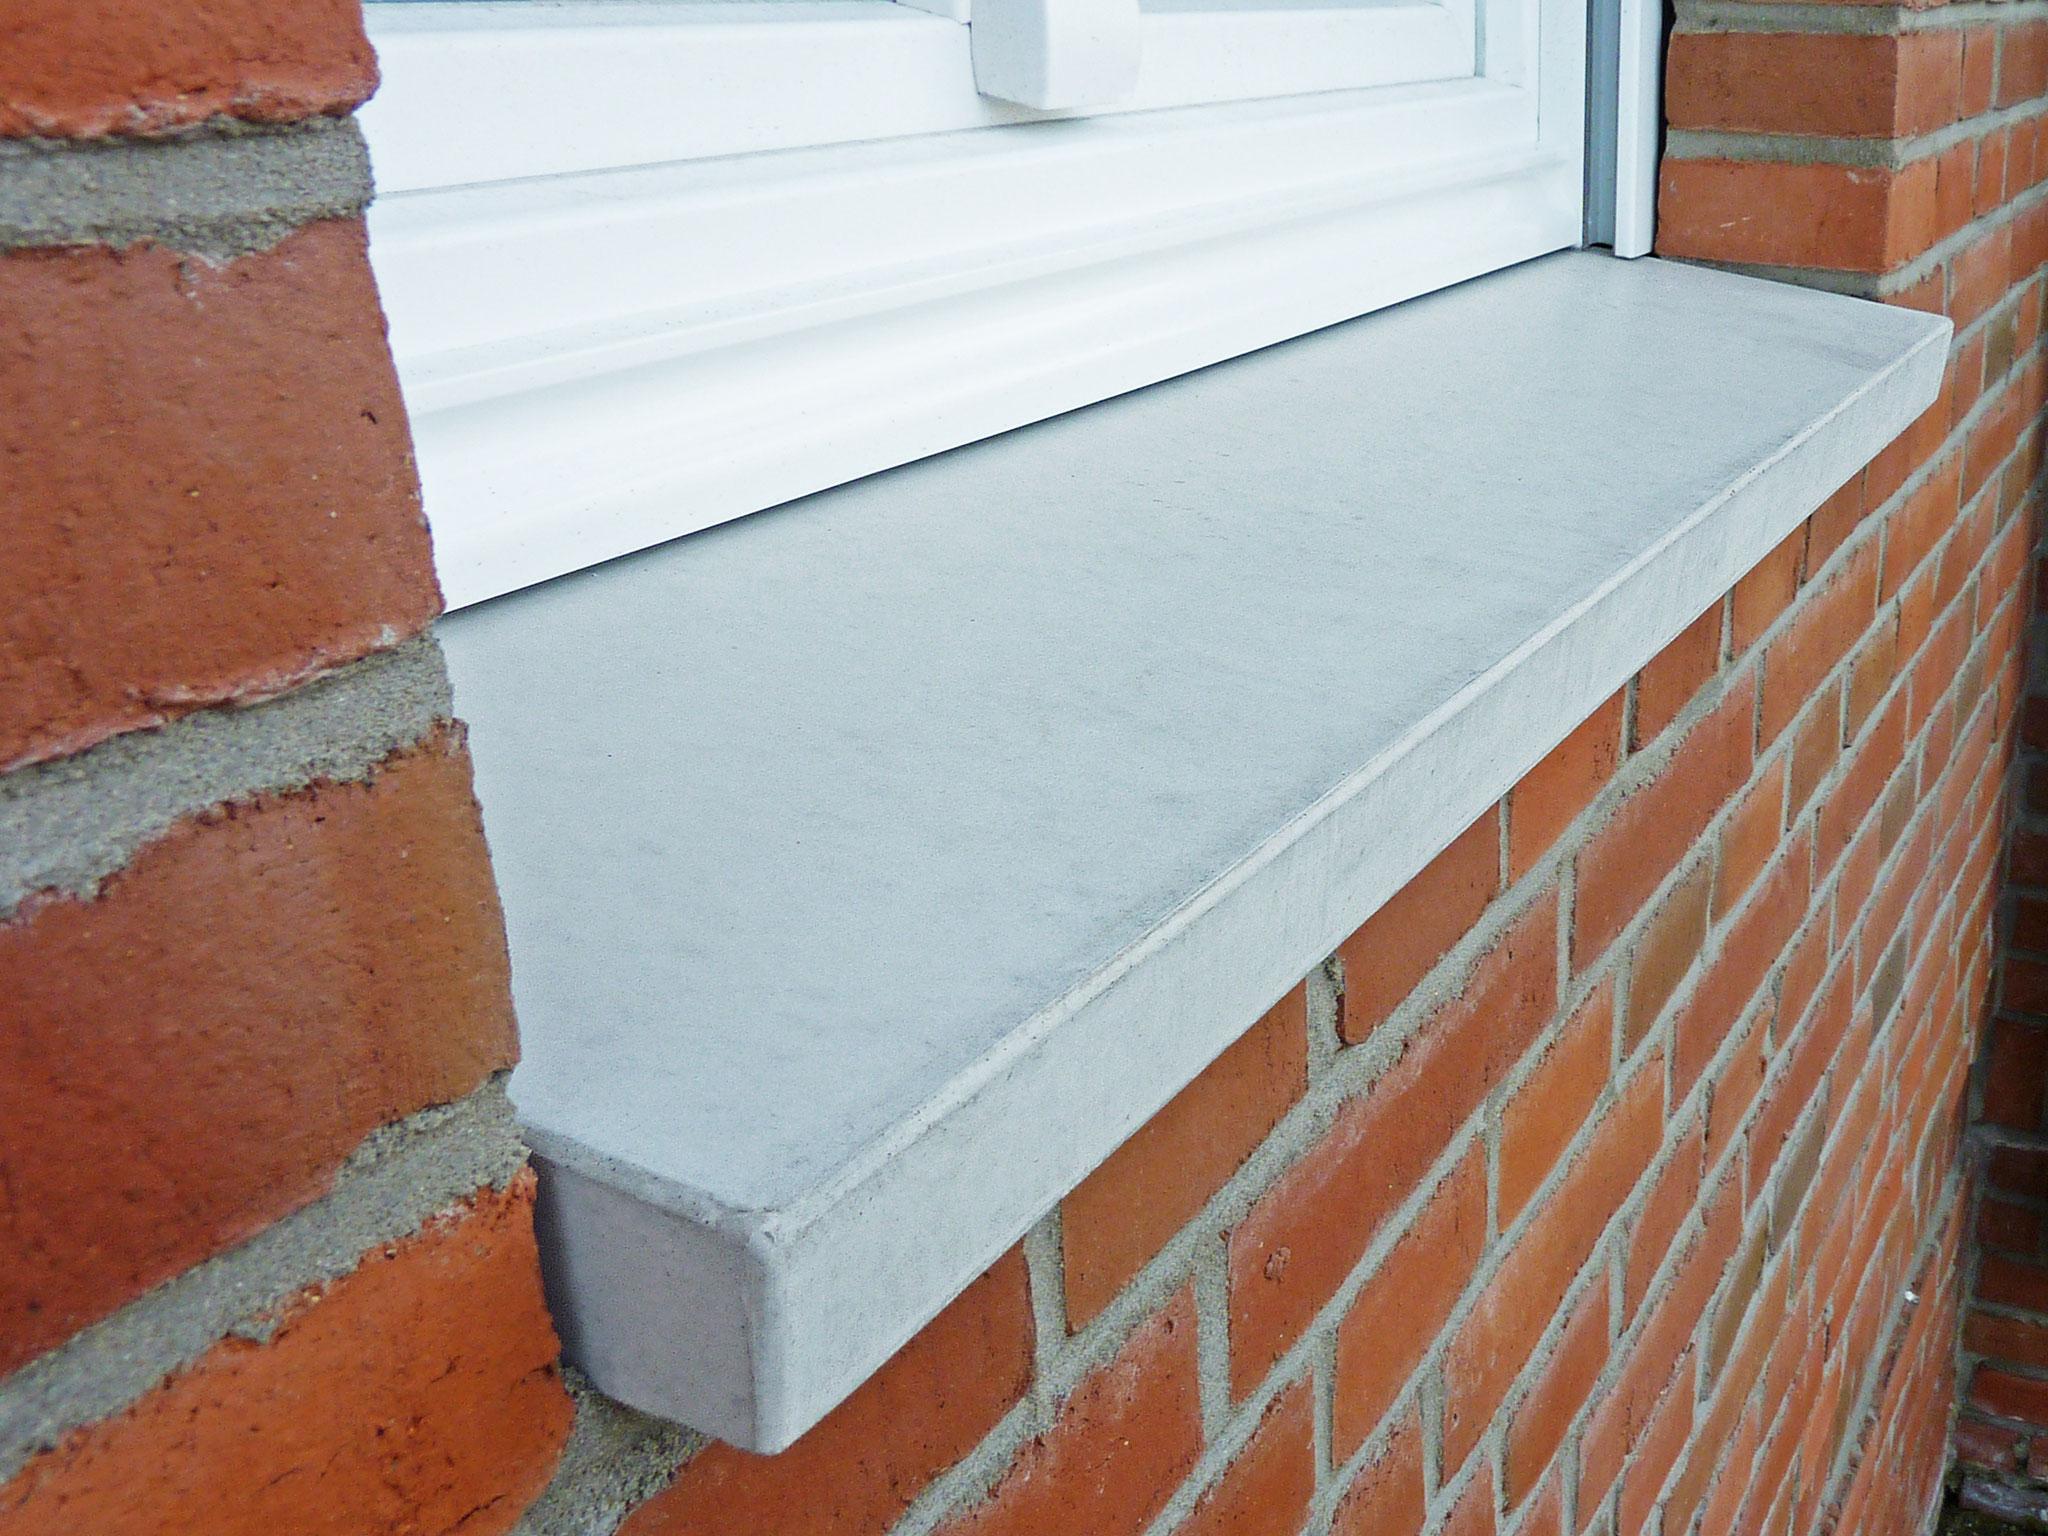 Color/Material: Concrete Grey